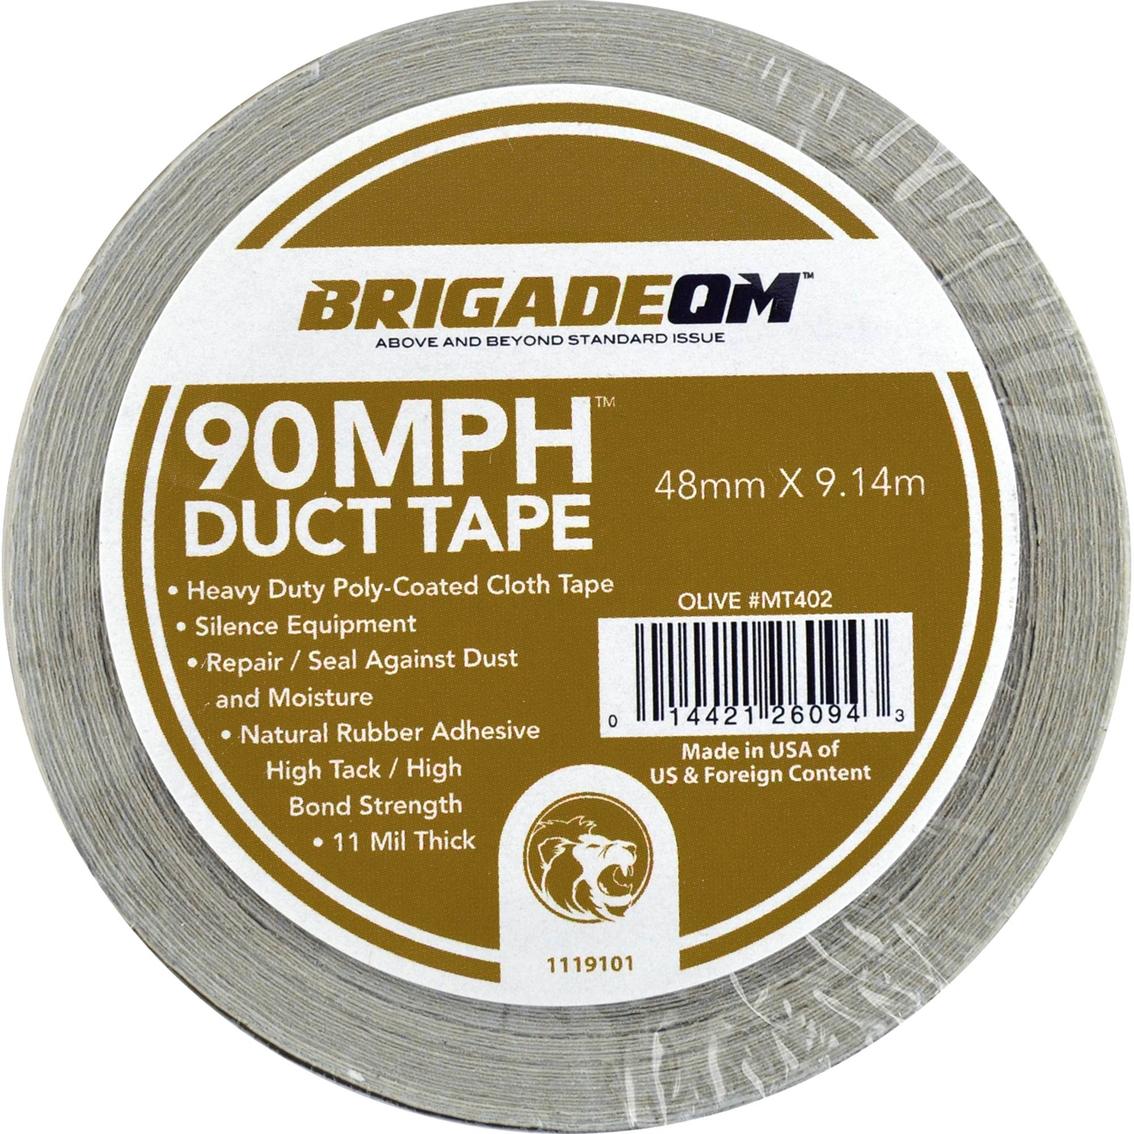 20ec77398bb9 Brigade Qm Army 90 Mph Duct Tape 2 In. X 10 Yd.